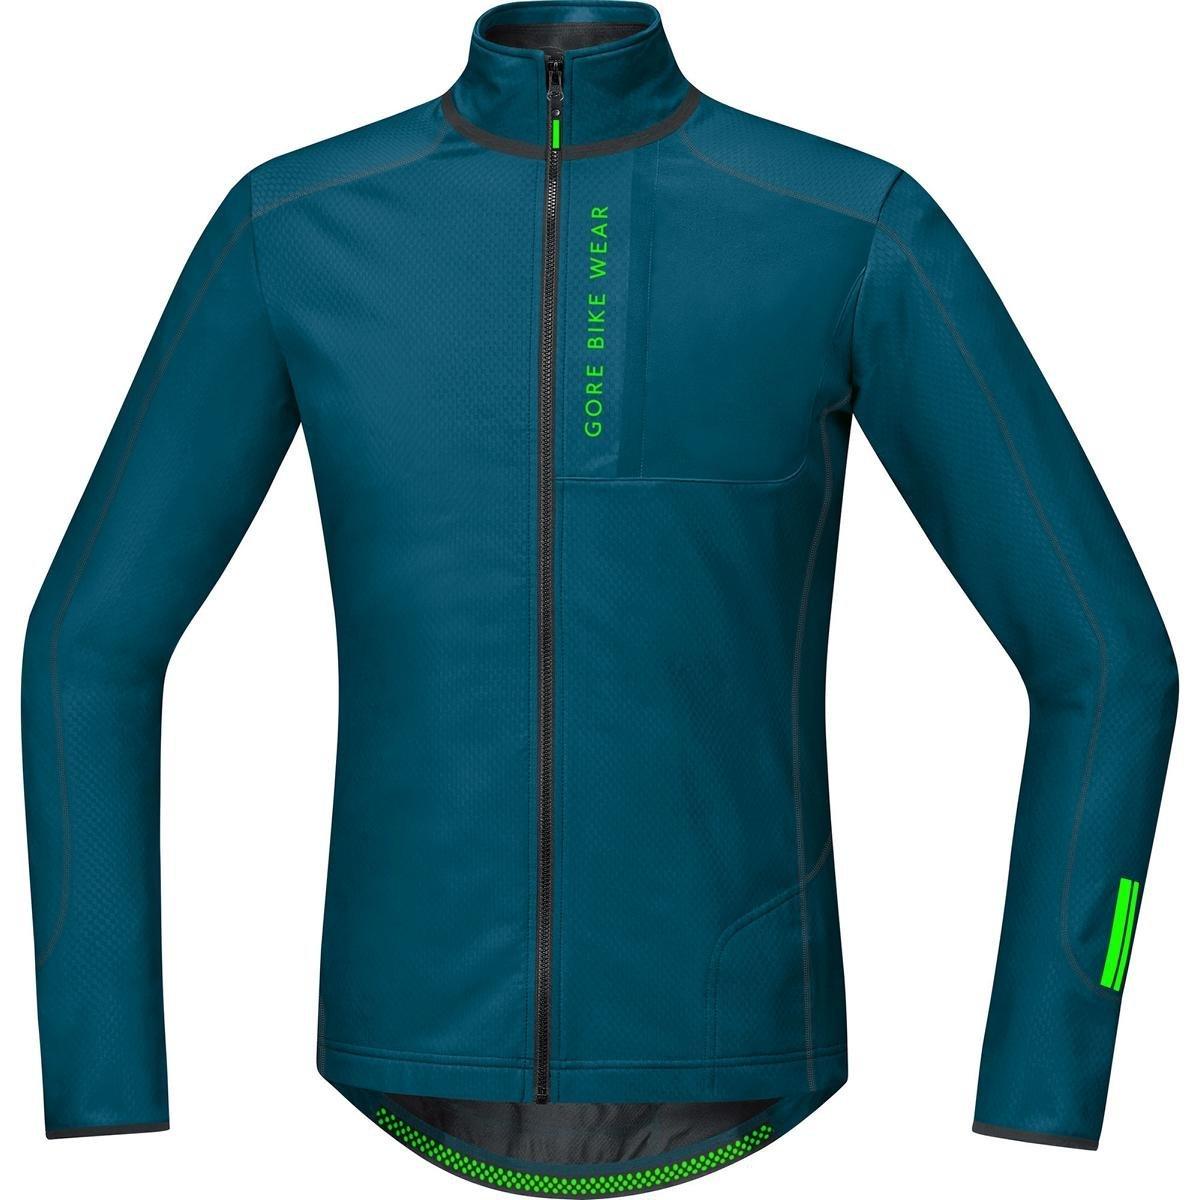 53b4fb46bc8 GORE WEAR Spowet Power Trail Maillot de cyclisme Homme Ink Blue FR   M  (Taille Fabricant   M)  Amazon.fr  Sports et Loisirs